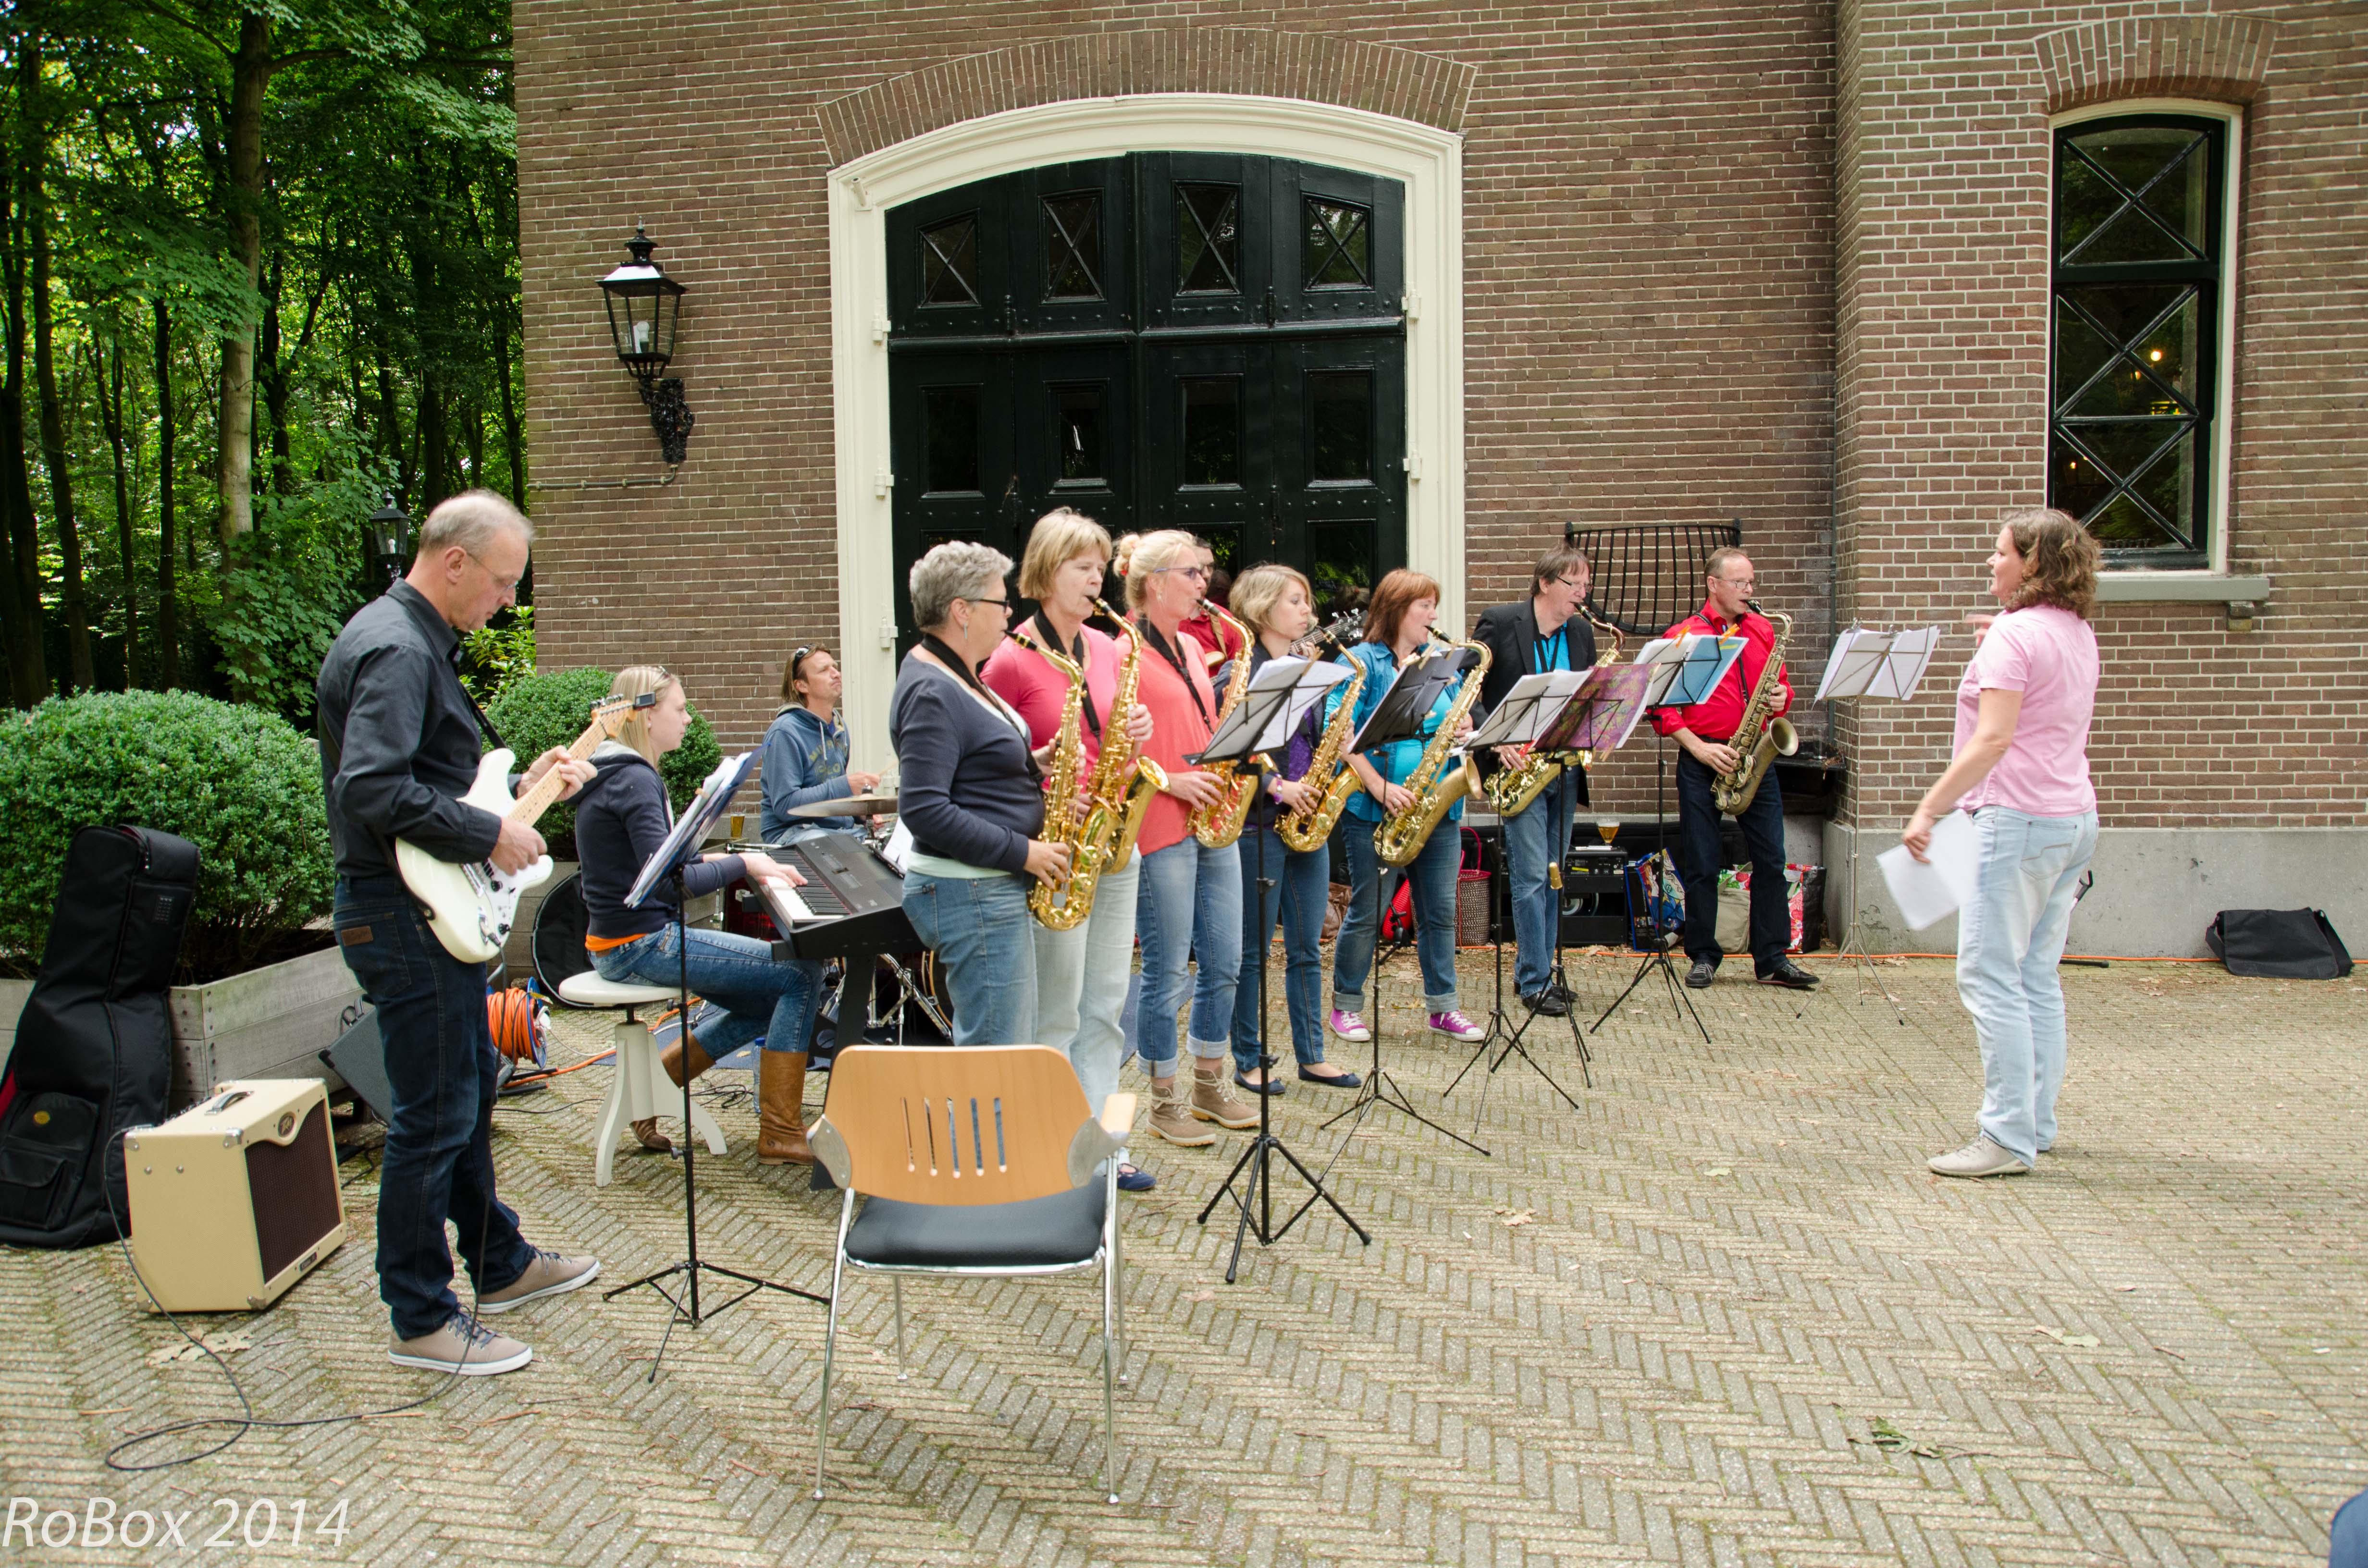 Kasteel Oud Poelgeest 2014